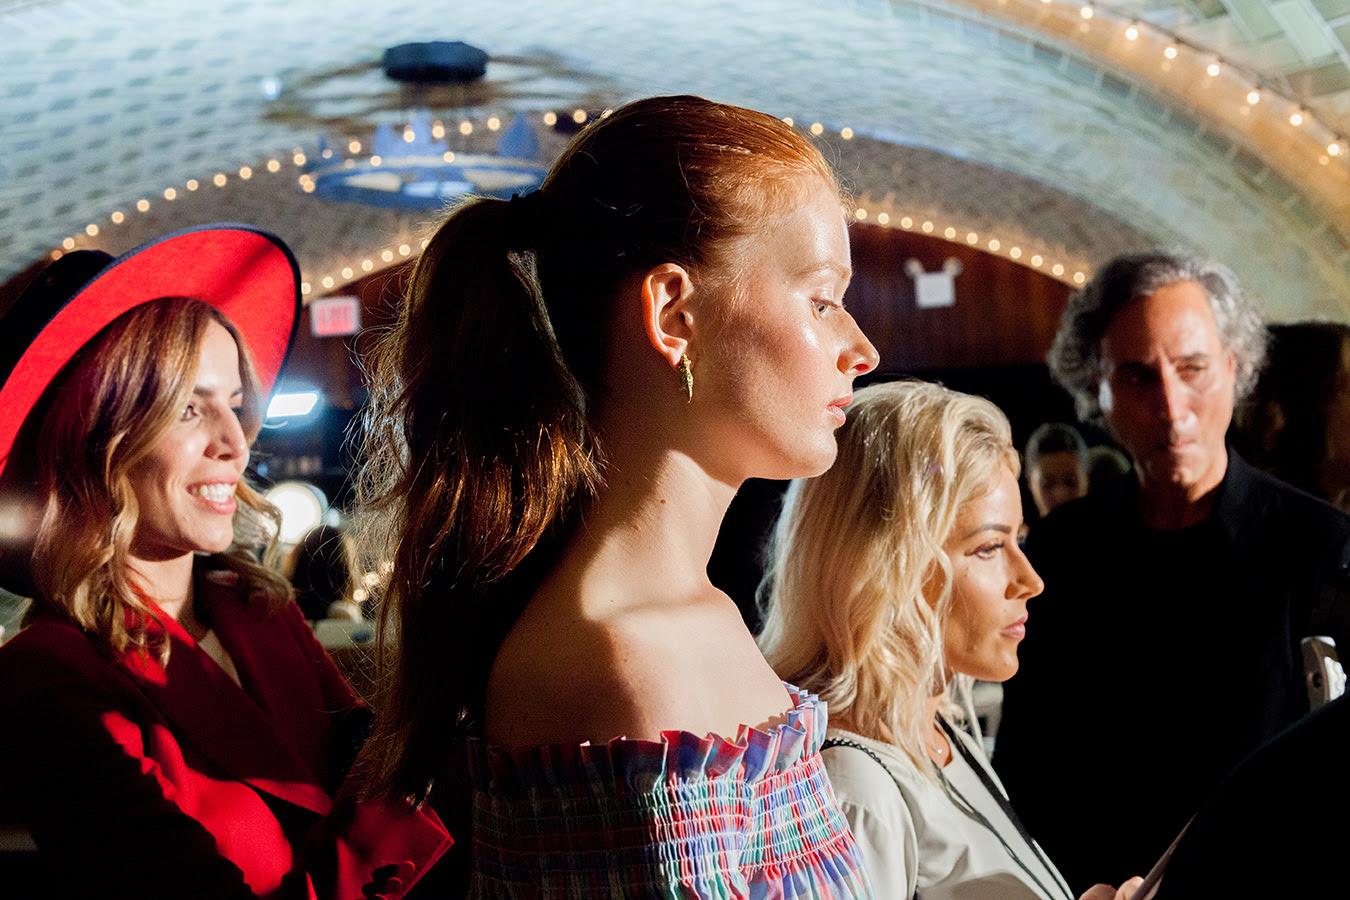 fashion, runway, makeup trends, hair, tips, tricks, chic studios, amy nicole, makeup school, beauty blog, jill stuart, kate spade, oscar de la renta, kith sport, delpozo, Mansur Gavriel, nyfw, new york fashion week, paris fashion week, milan fashion week